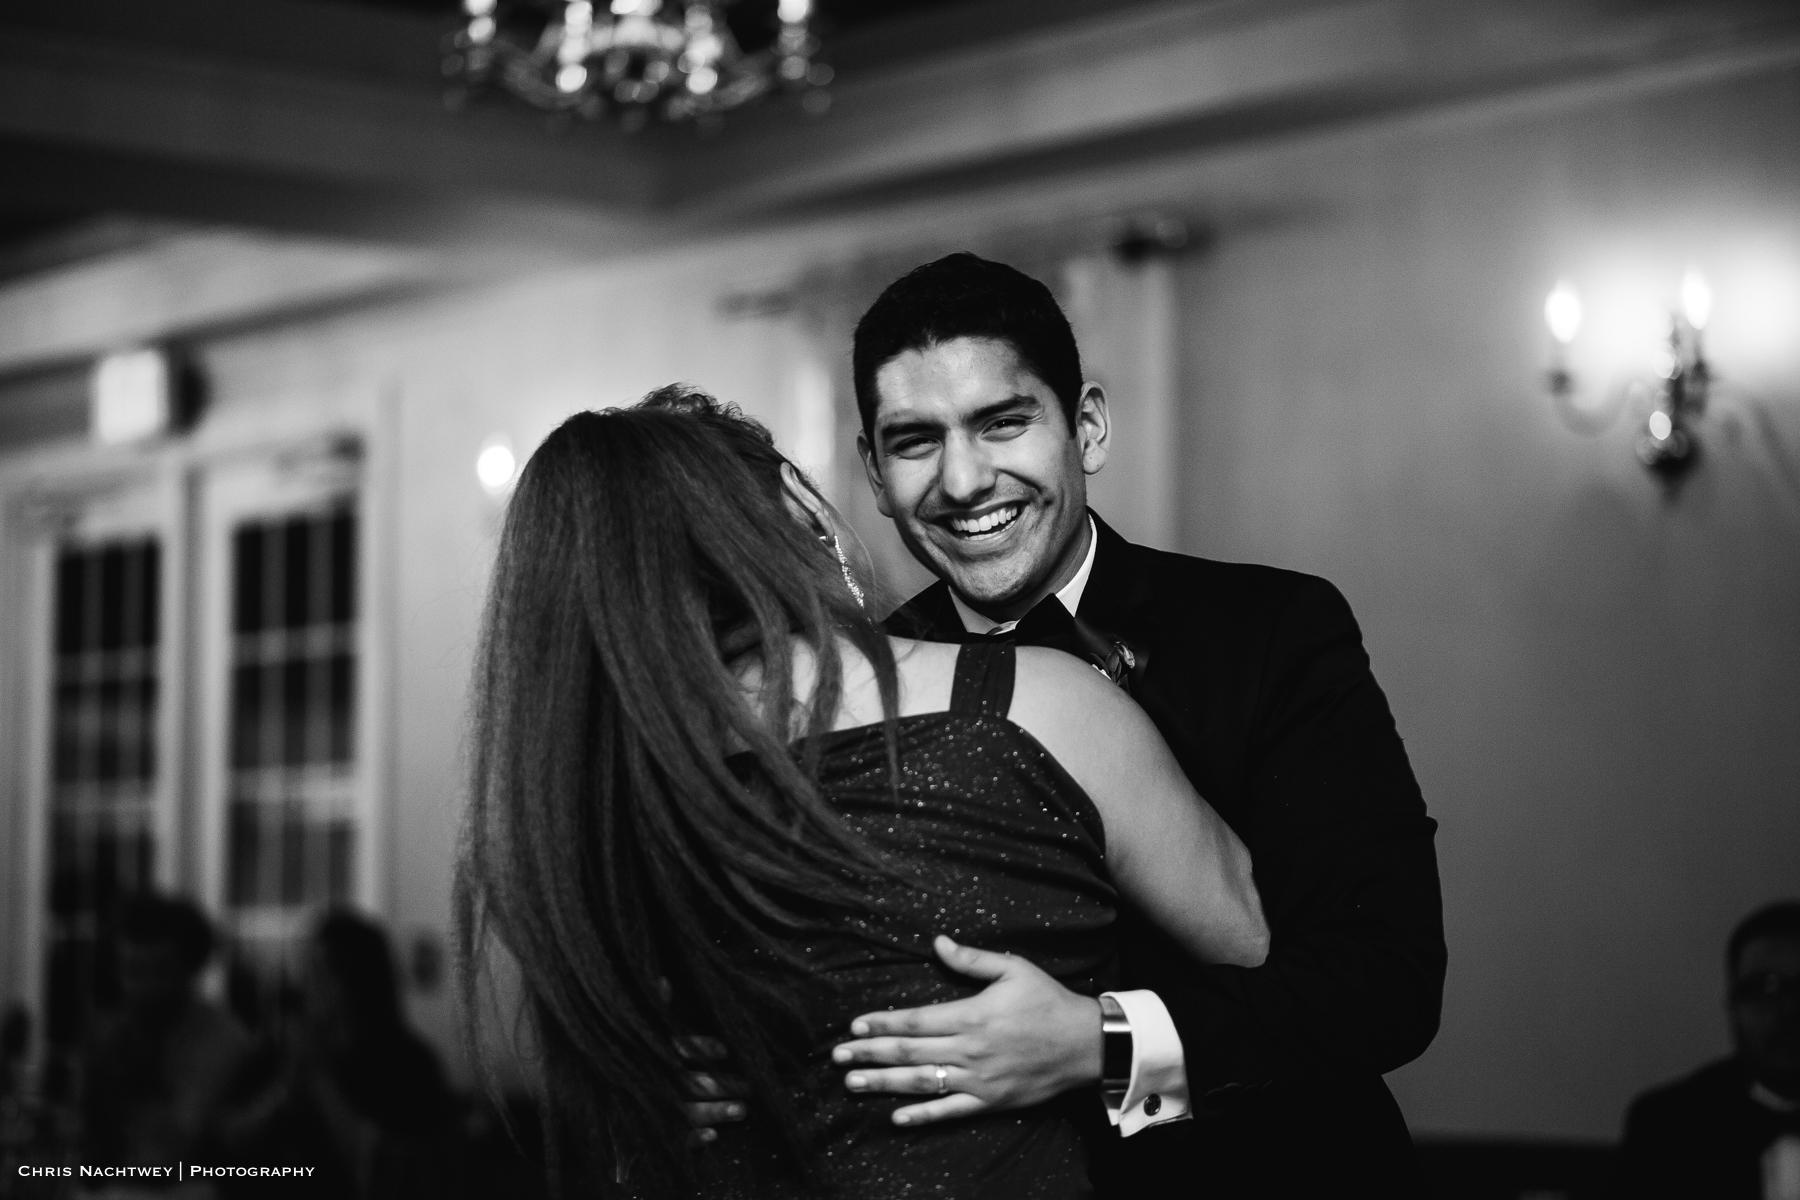 wedding-the-litchfield-inn-ct-photos-chris-nachtwey-photography-2018-59.jpg